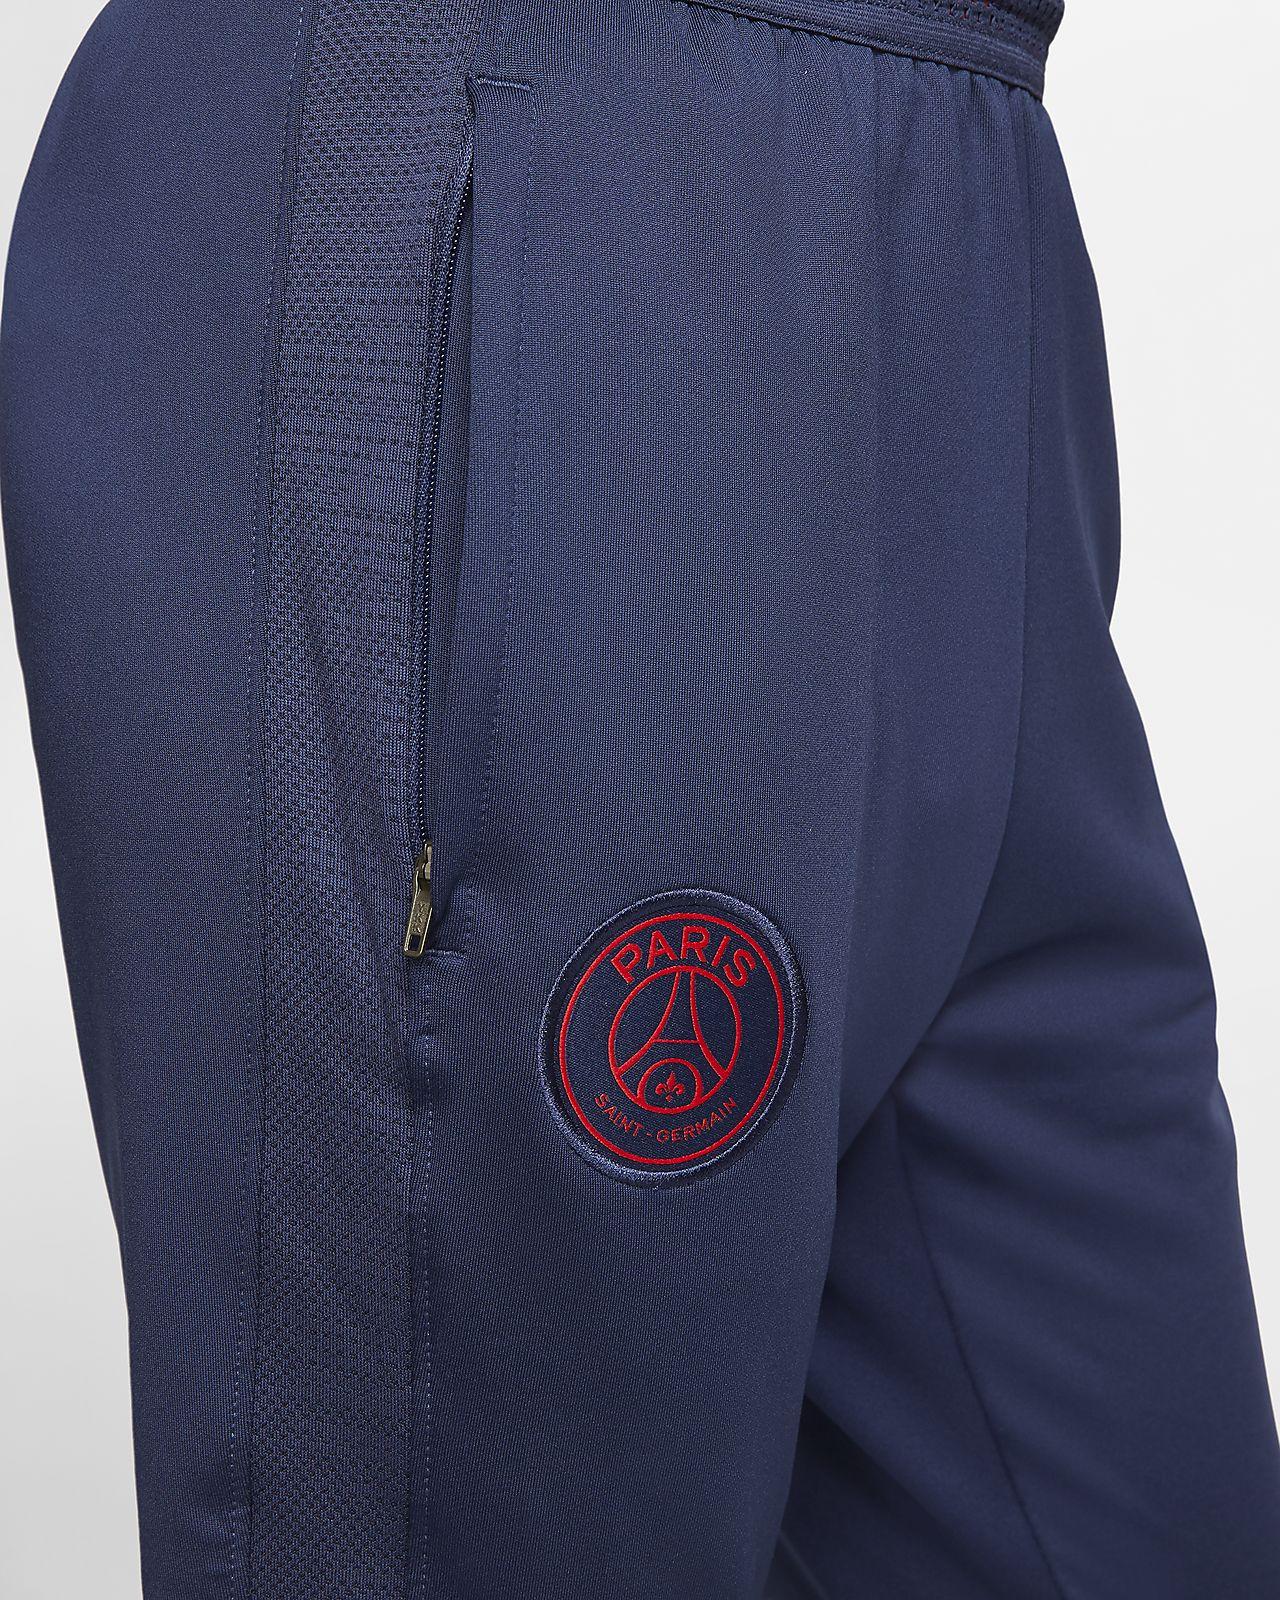 NIKE Youth Dry Paris Saint Germain Squad Pants Black